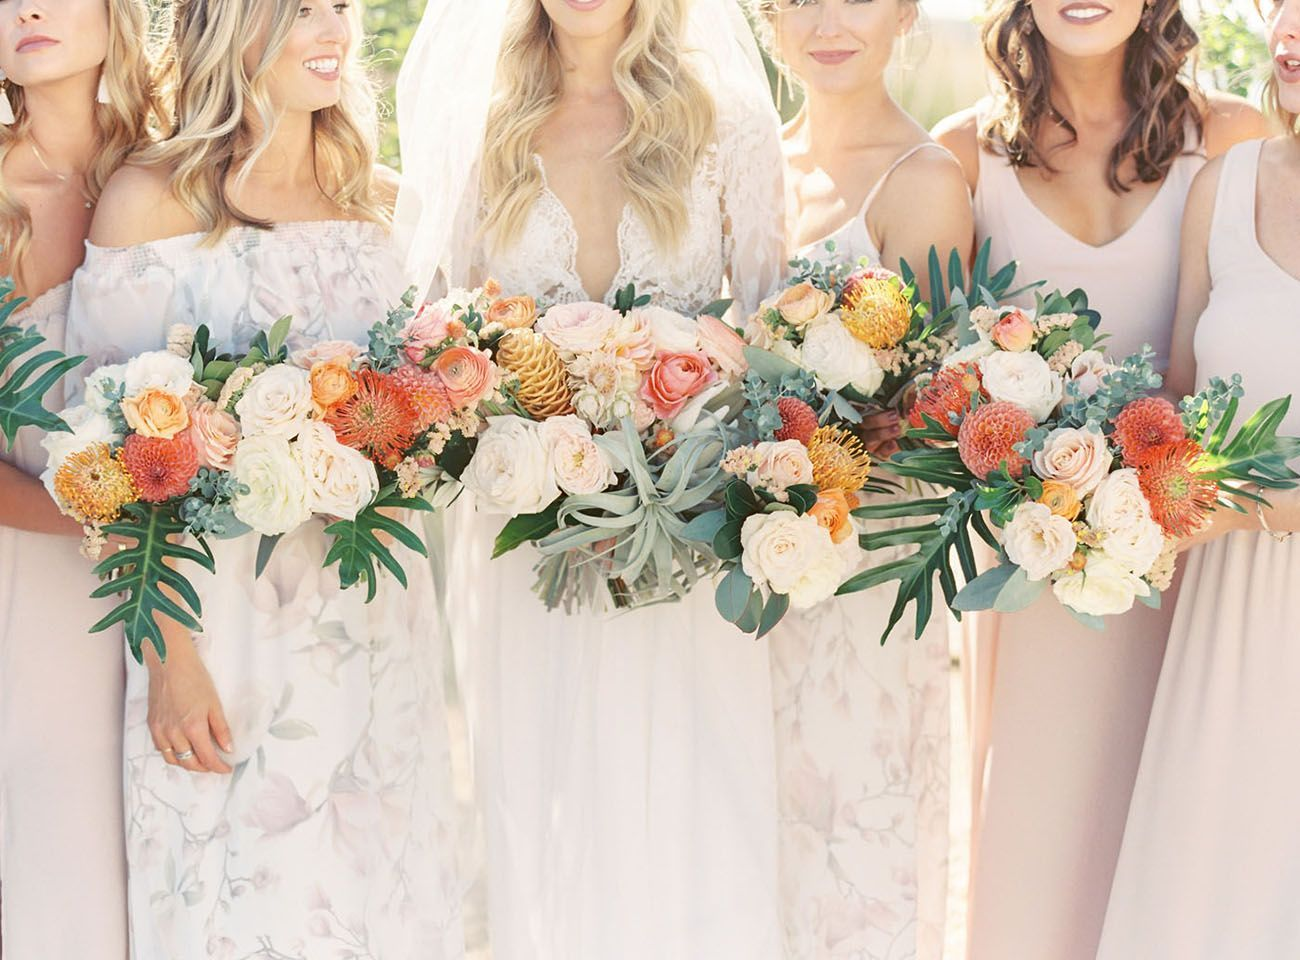 Tropical Bouquets For A Boho Beach Theme Wedding Bride In